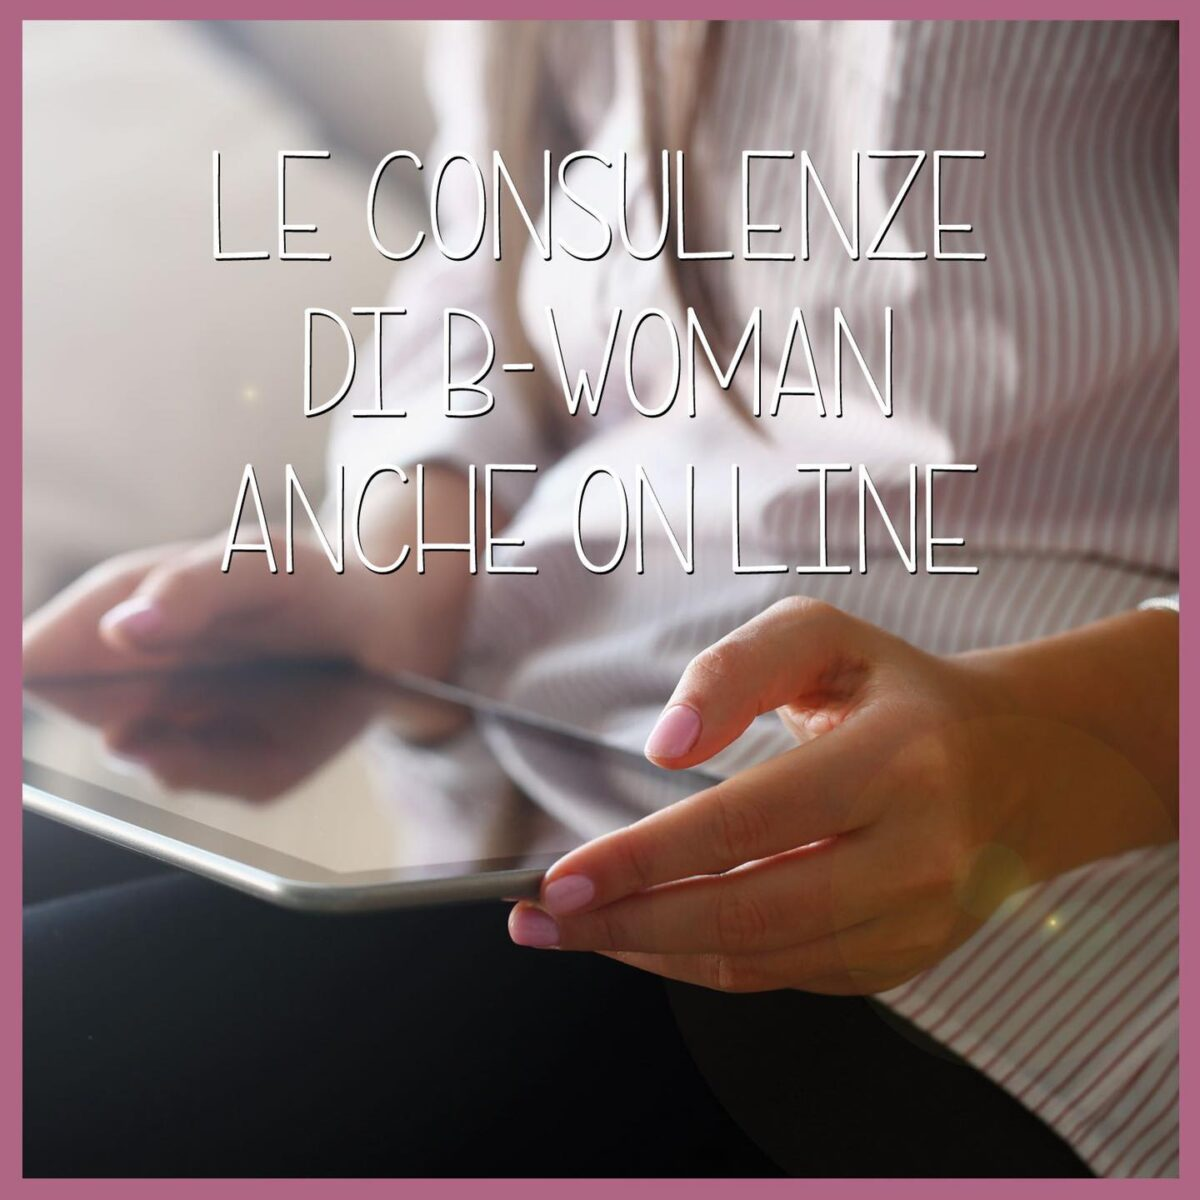 le-consulenze-B-Woman-anche-on-line-1200x1200.jpg